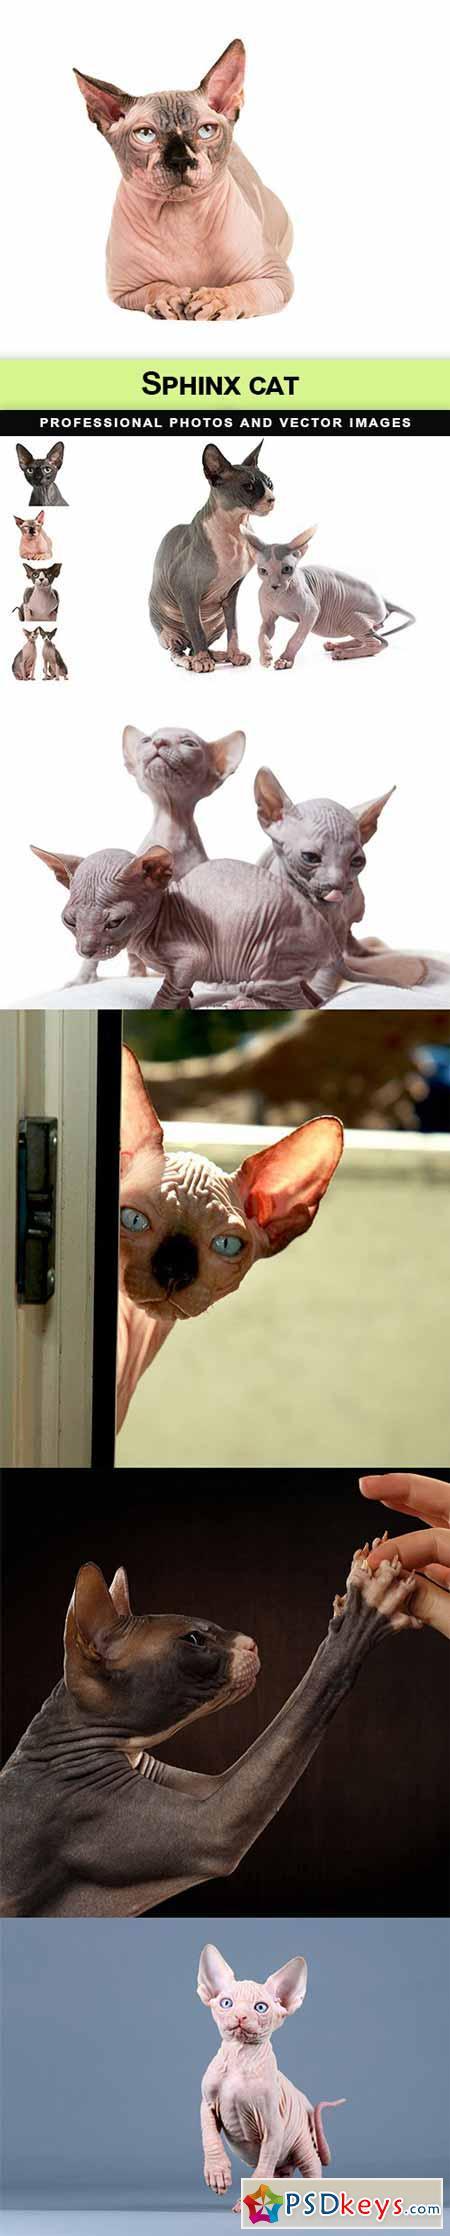 Sphinx cat - 9 UHQ JPEG